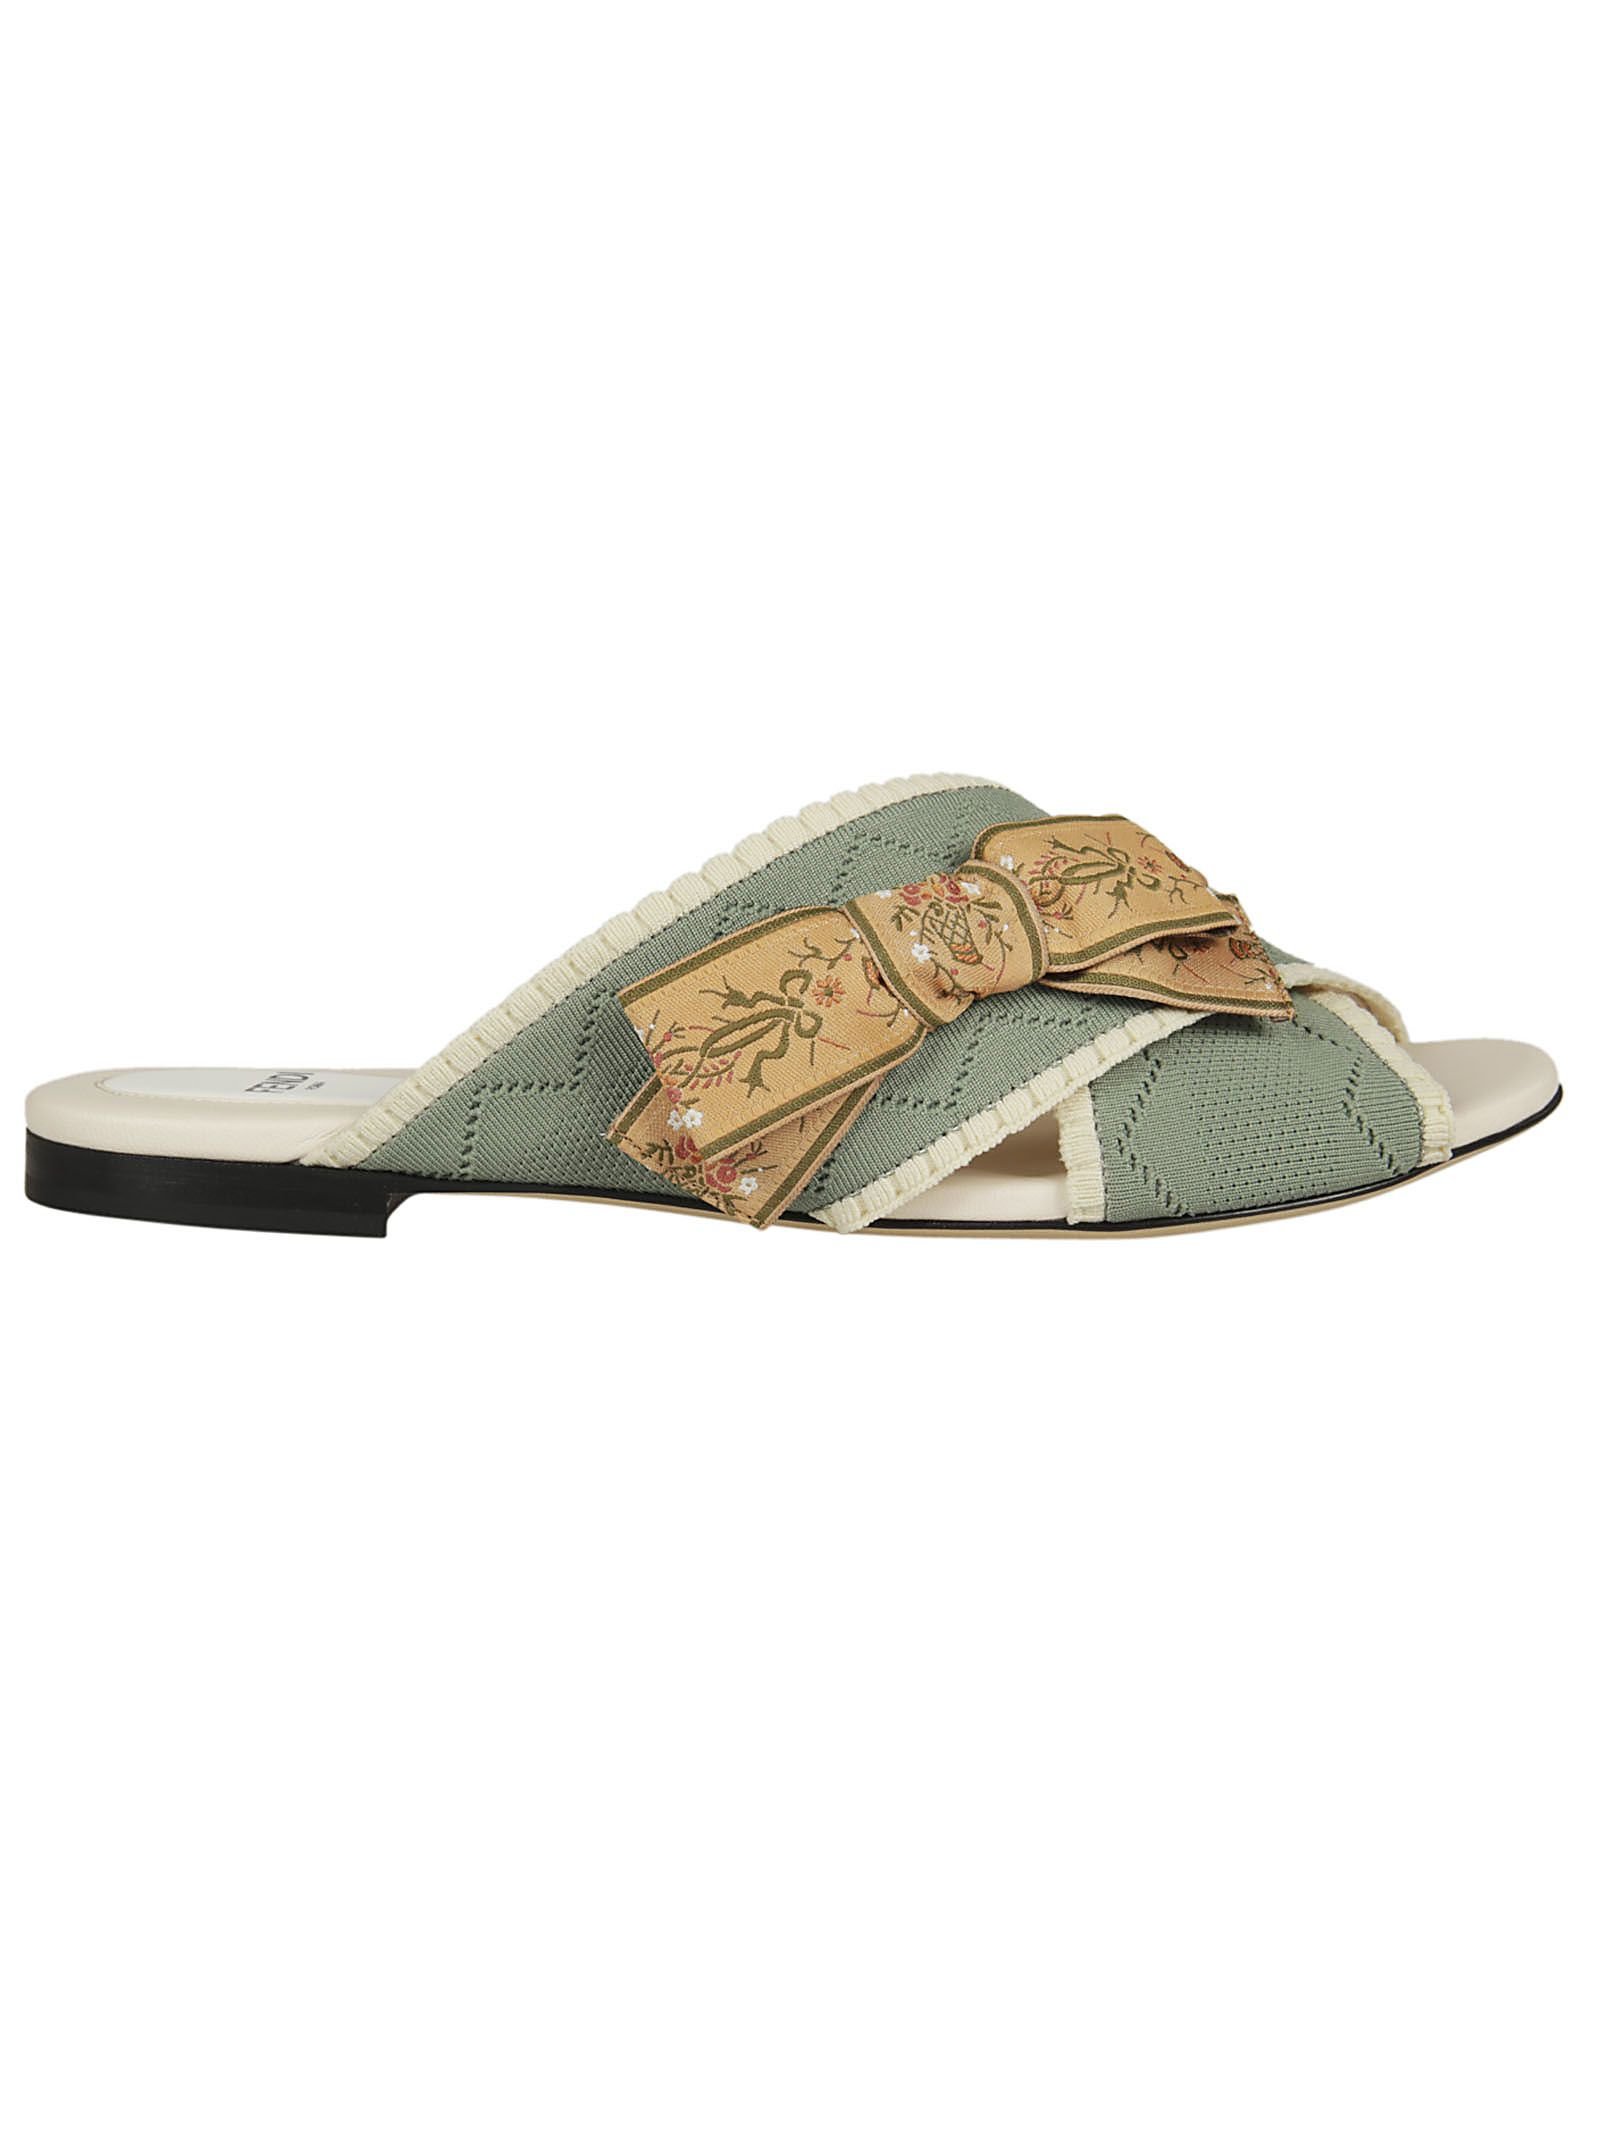 Fendi Bow Detail Flat Sandals